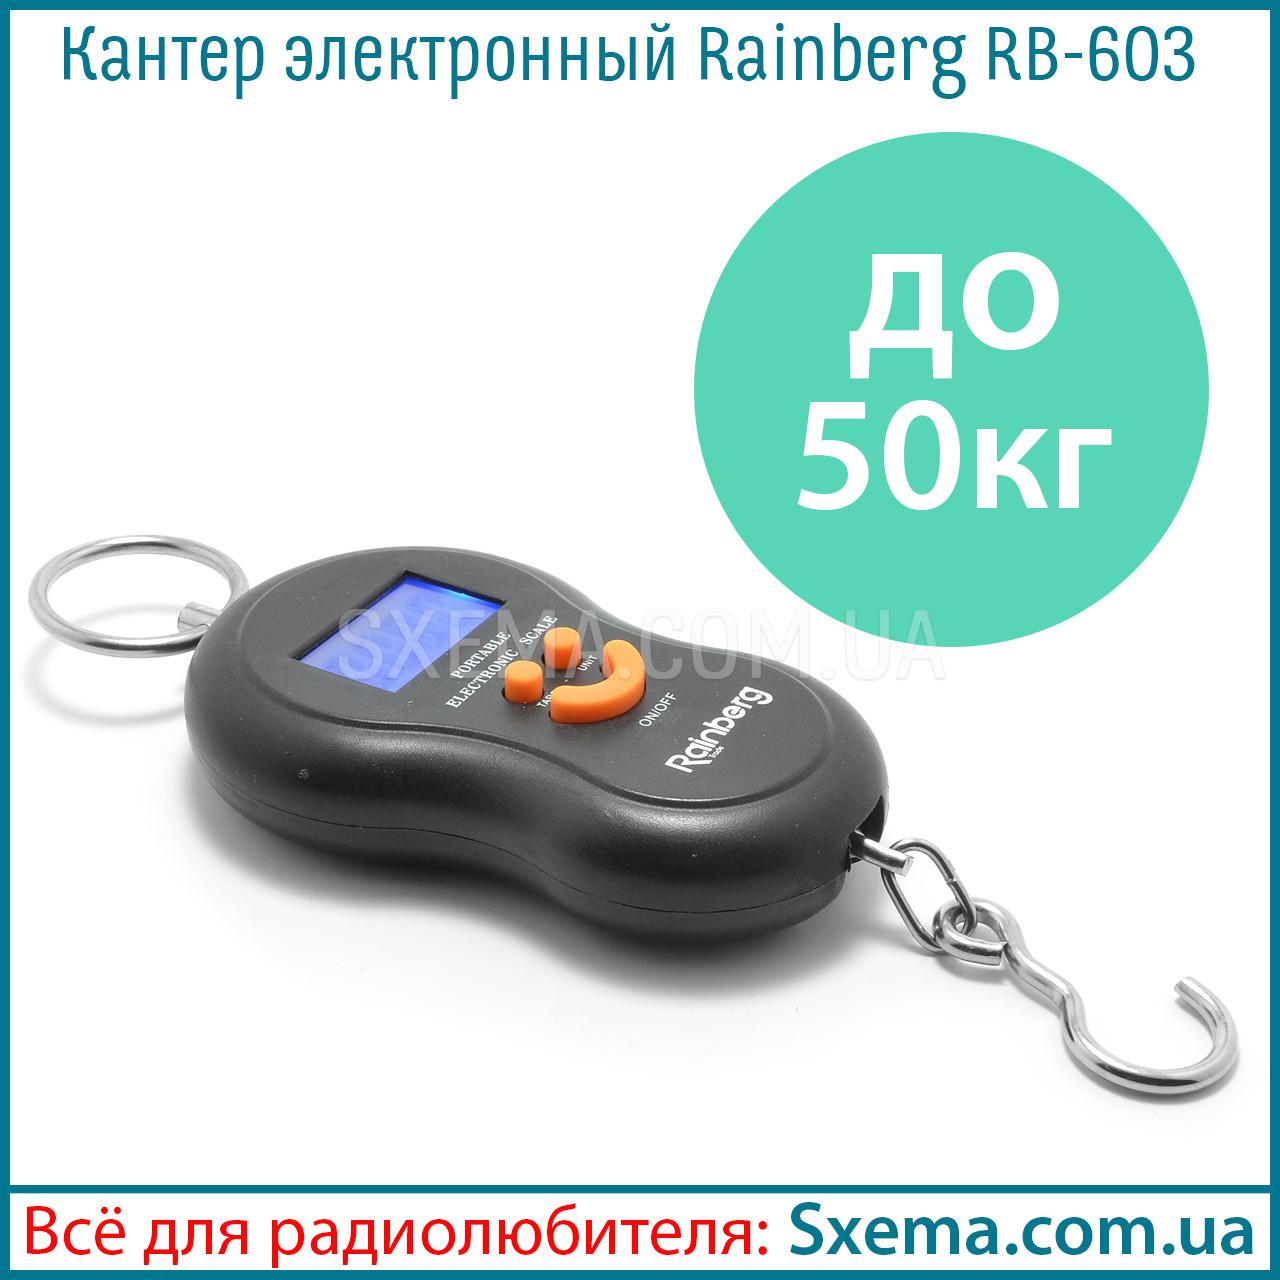 Кантер электронный Rainberg RB-603 до 50 кг